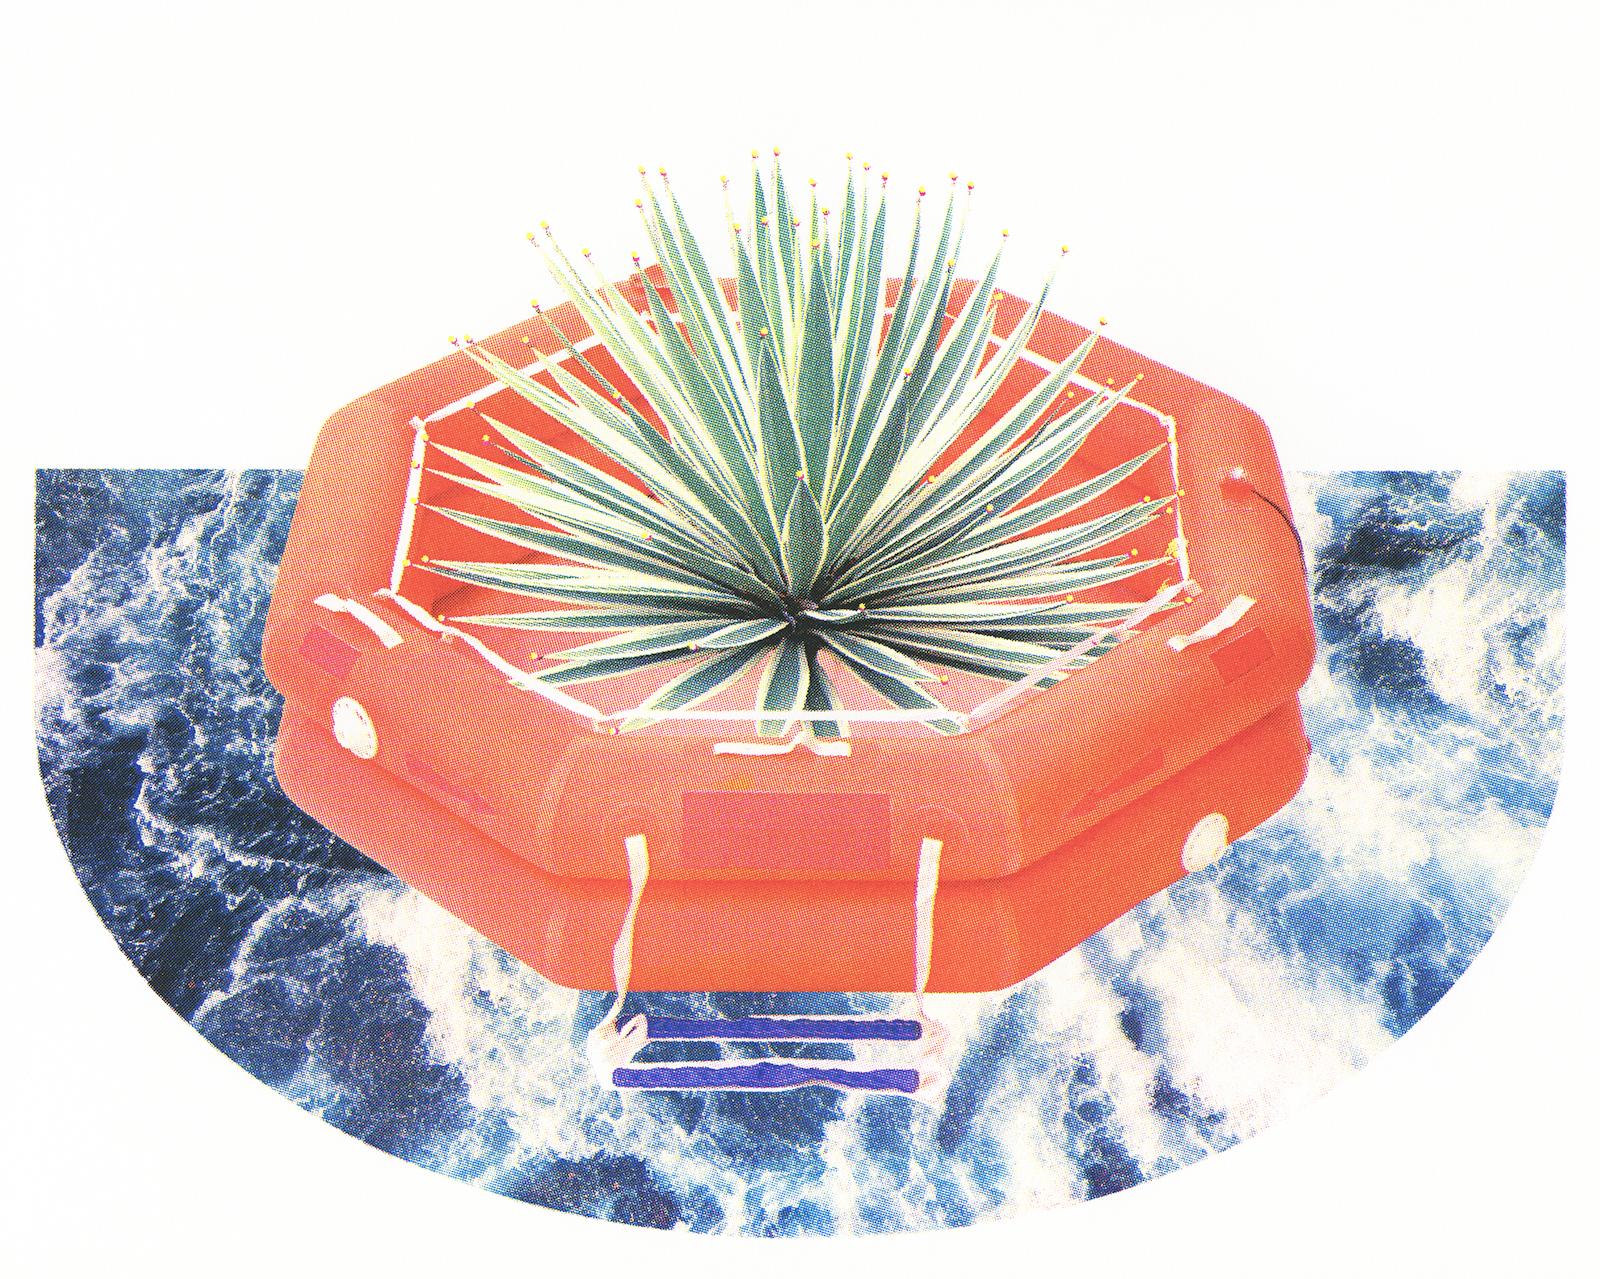 - Aqua Culture2016Screen print with fluorescent pigment15 x 20 inchesedition of 24